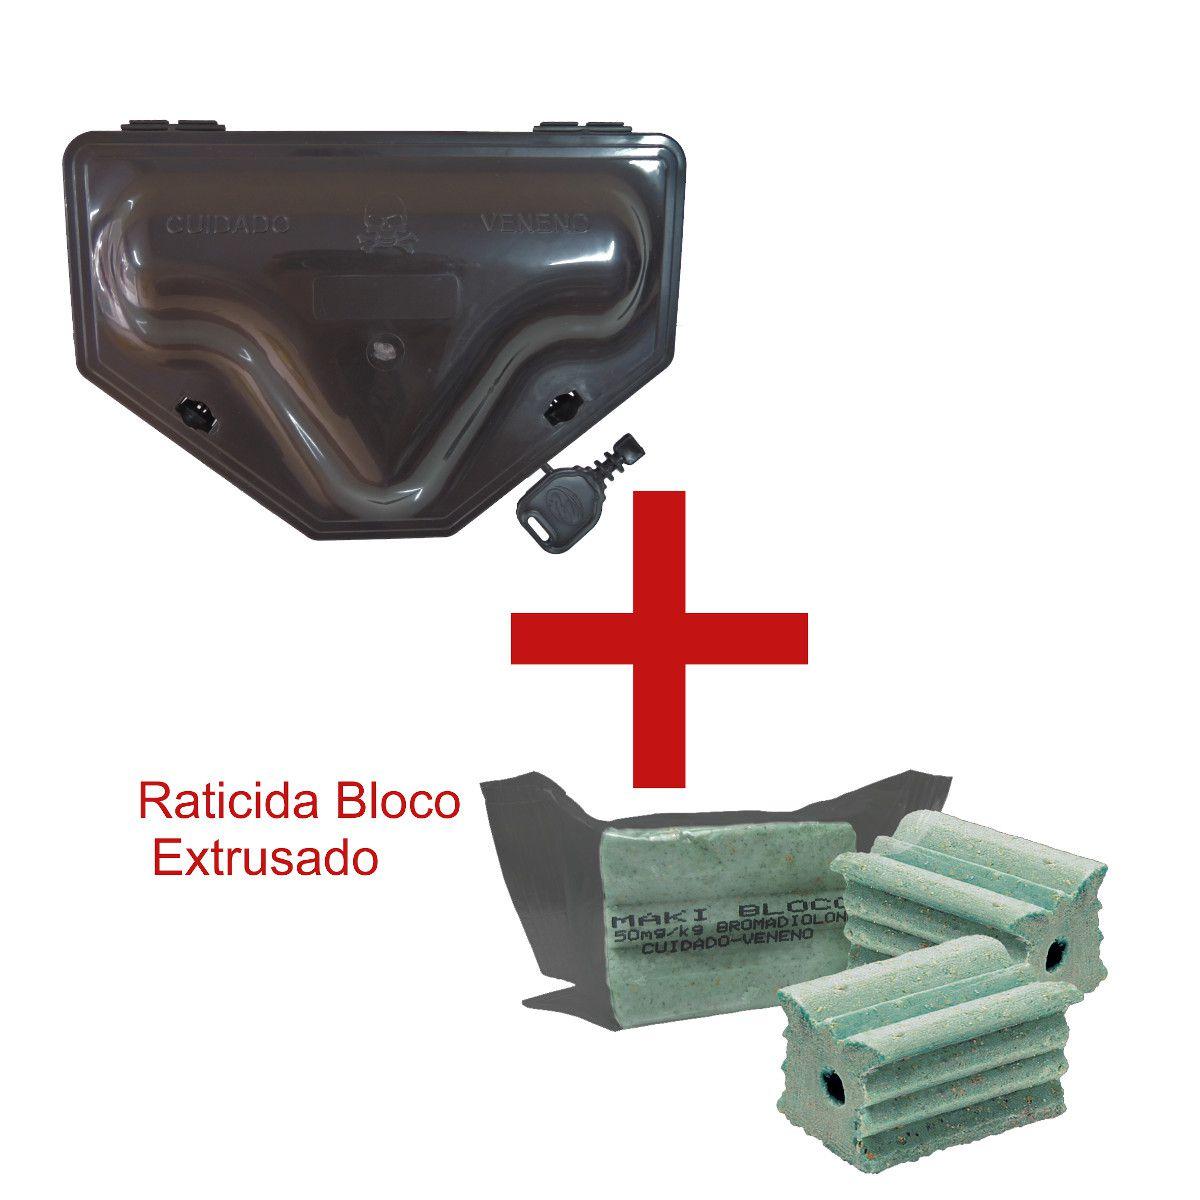 KIT 6 Porta Iscas Reforçado Ratoeira 2 TRAVAS Chave p/ ratos